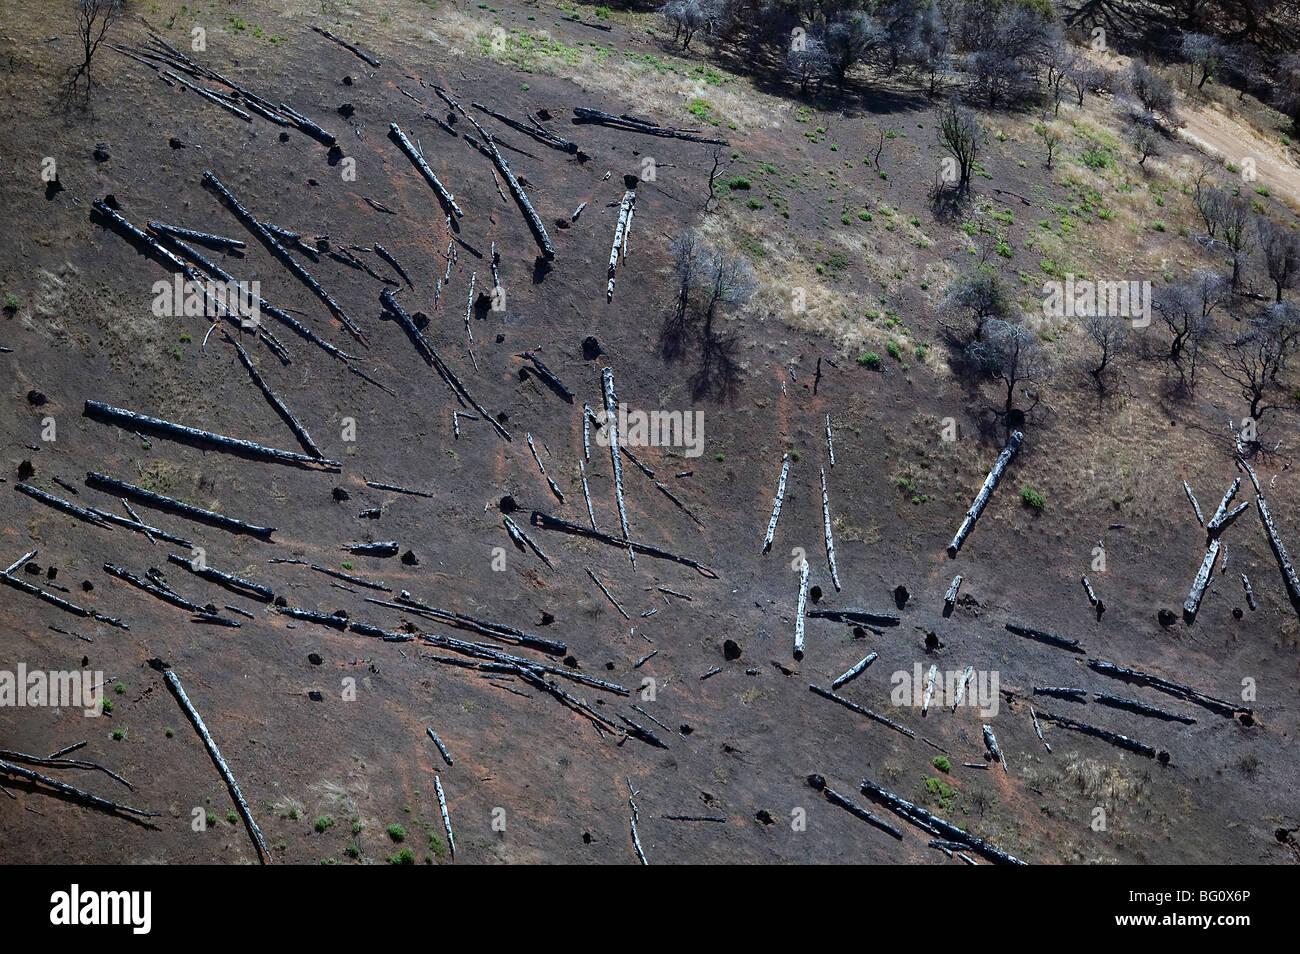 "Luftbild klar schneiden invasiver Arten Eukalyptus Angel Island ""San Francisco Bay"" Stockbild"